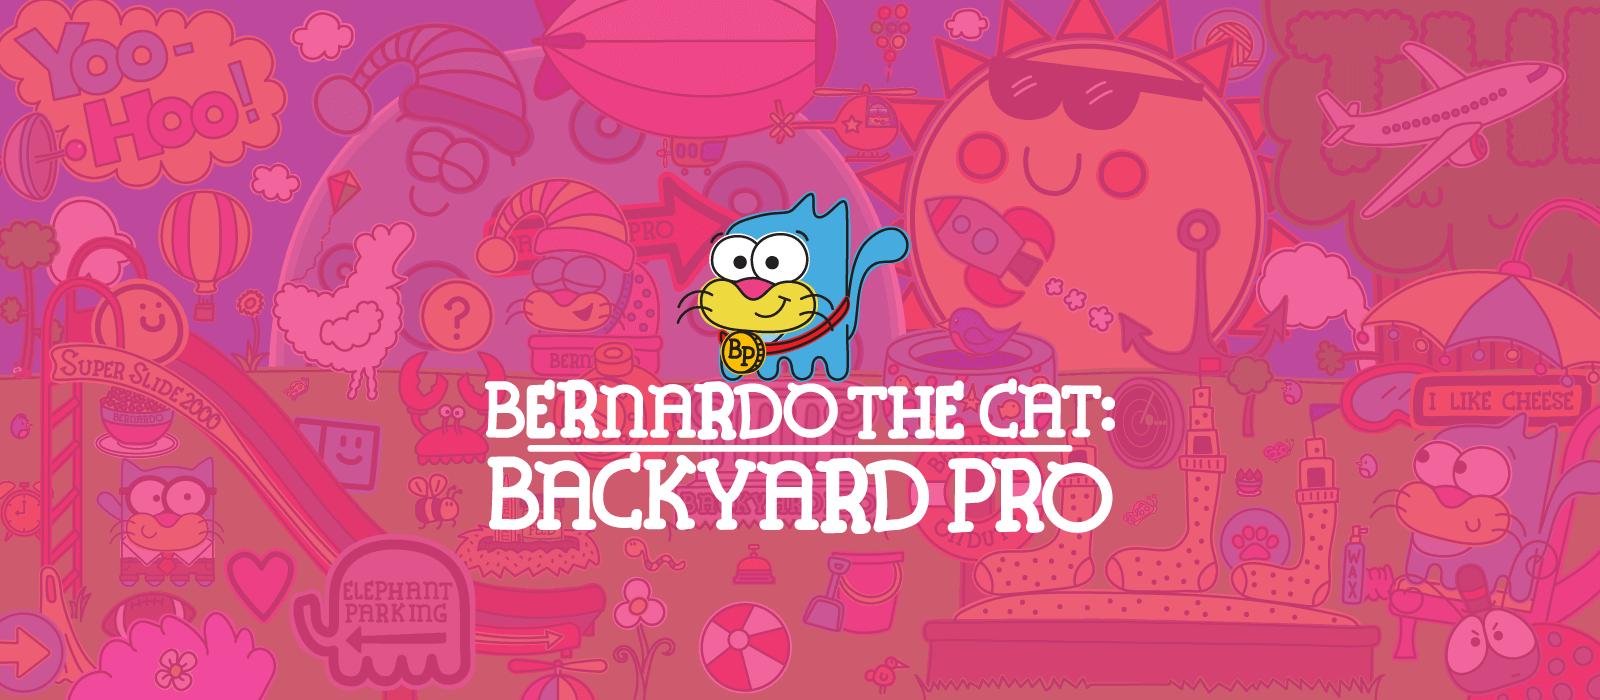 Bernardo the Cat: Backyard Pro